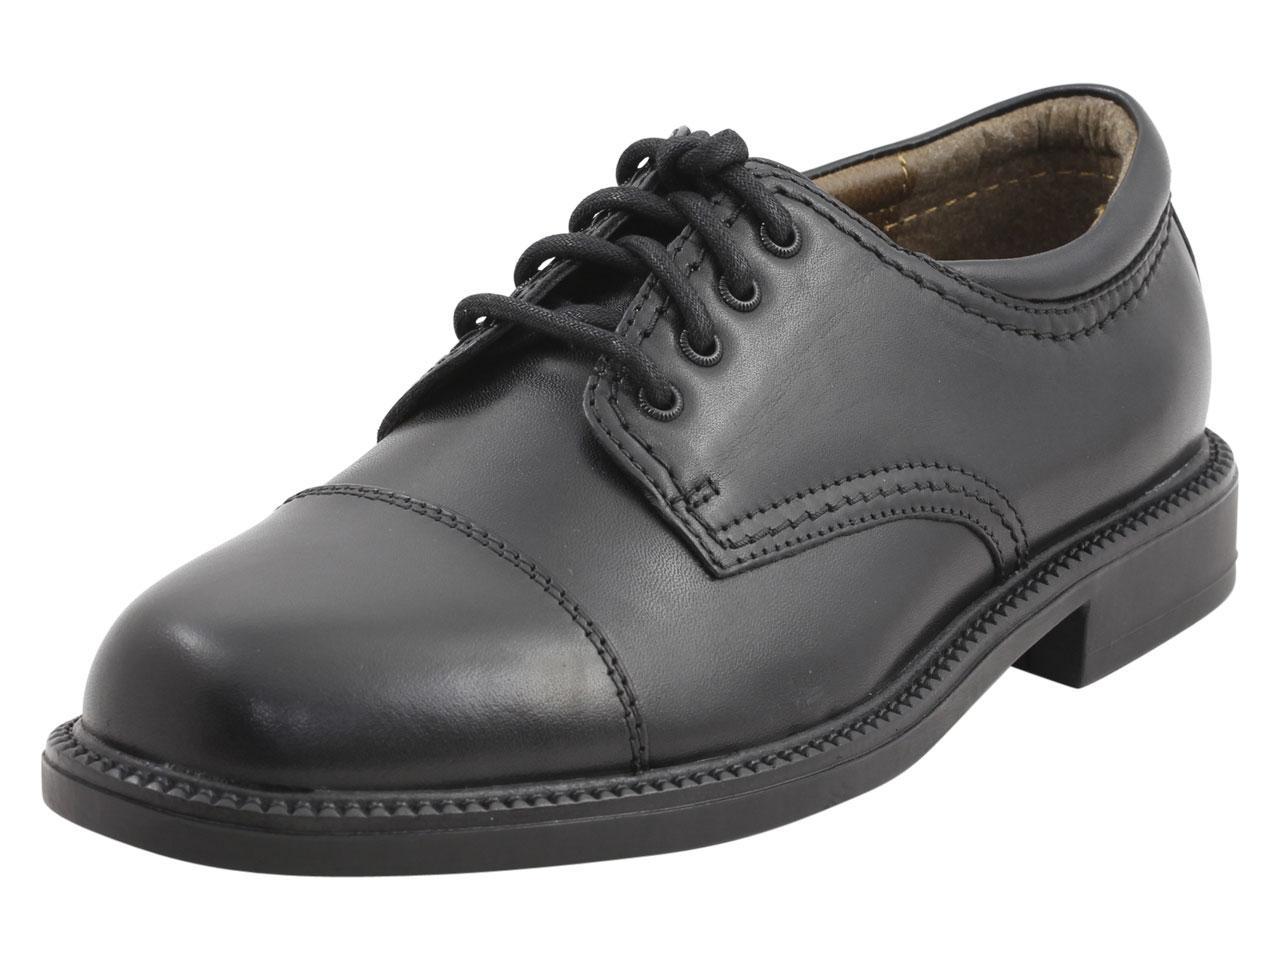 Image of Dockers Men's Gordon Cap Toe Oxfords Shoes - Black - 13 E(W) US